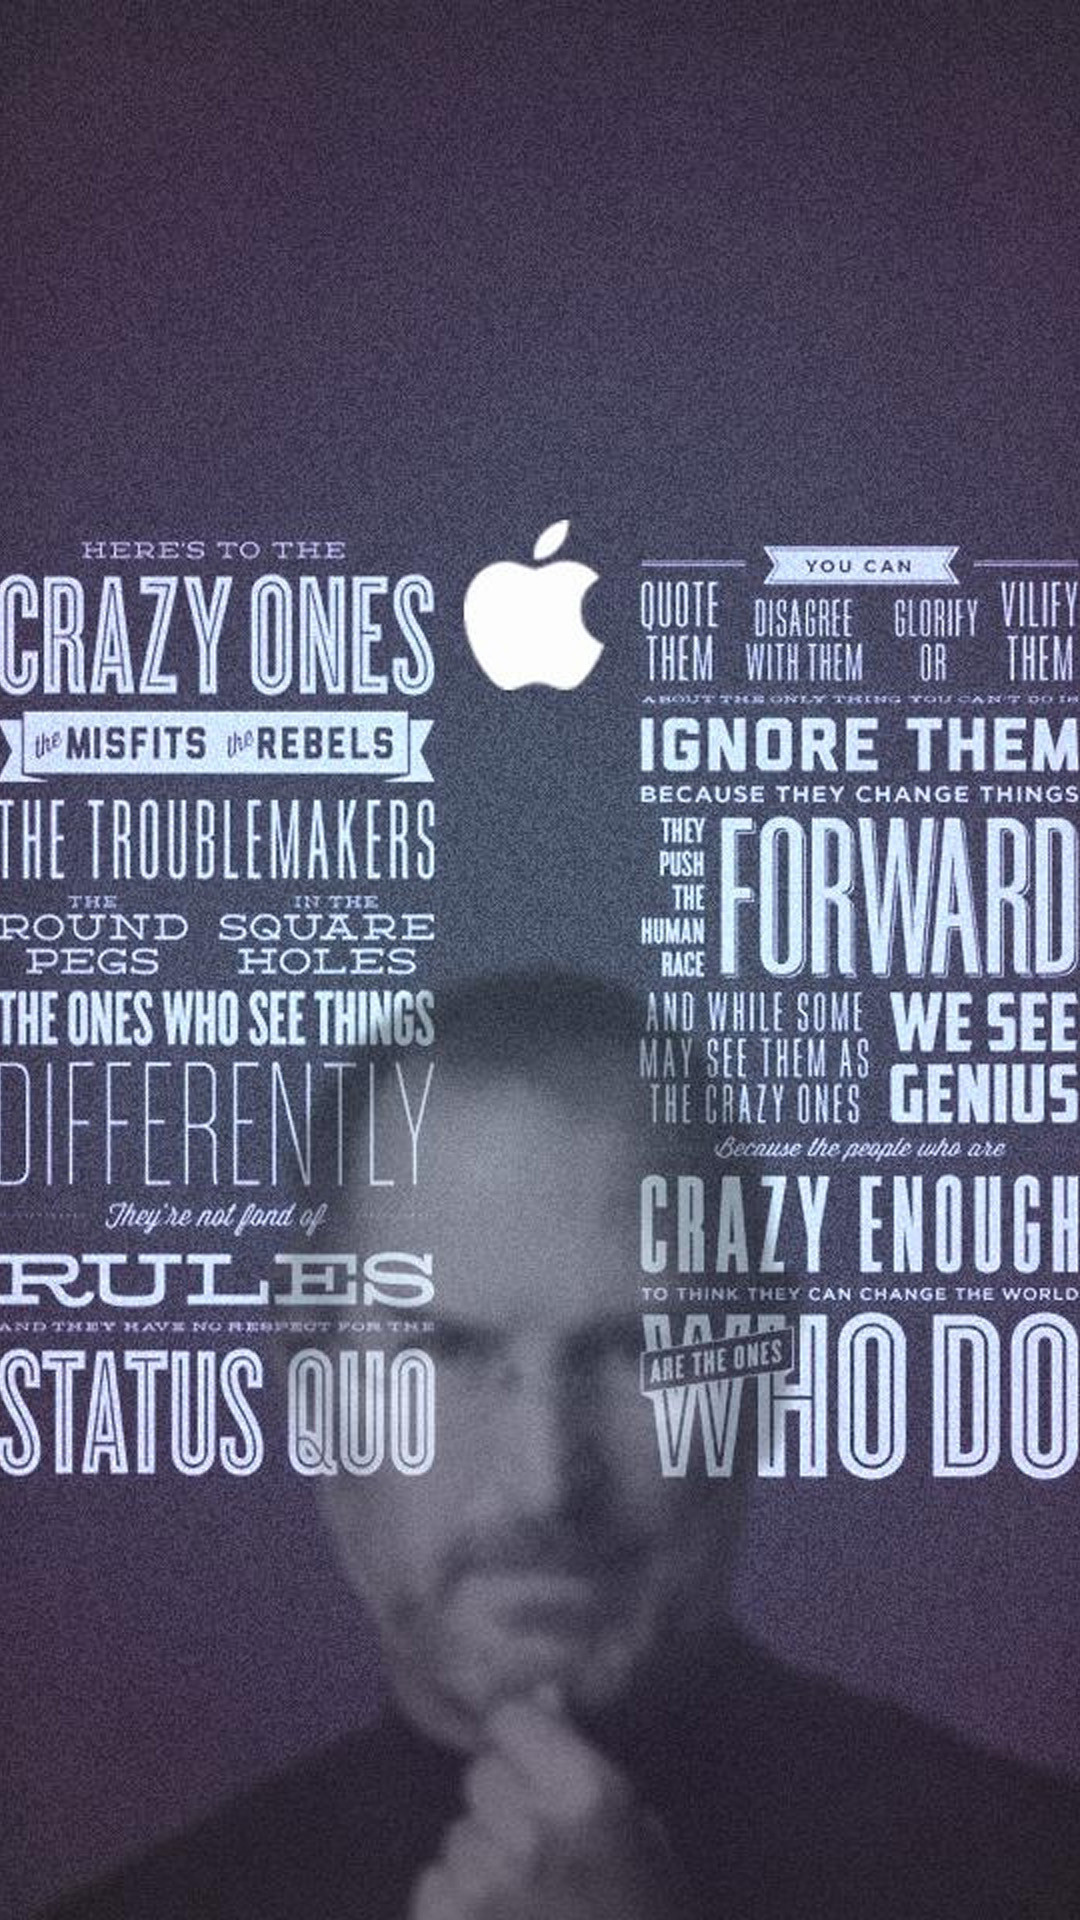 steve quotes hd wallpaper iphone 6 plus